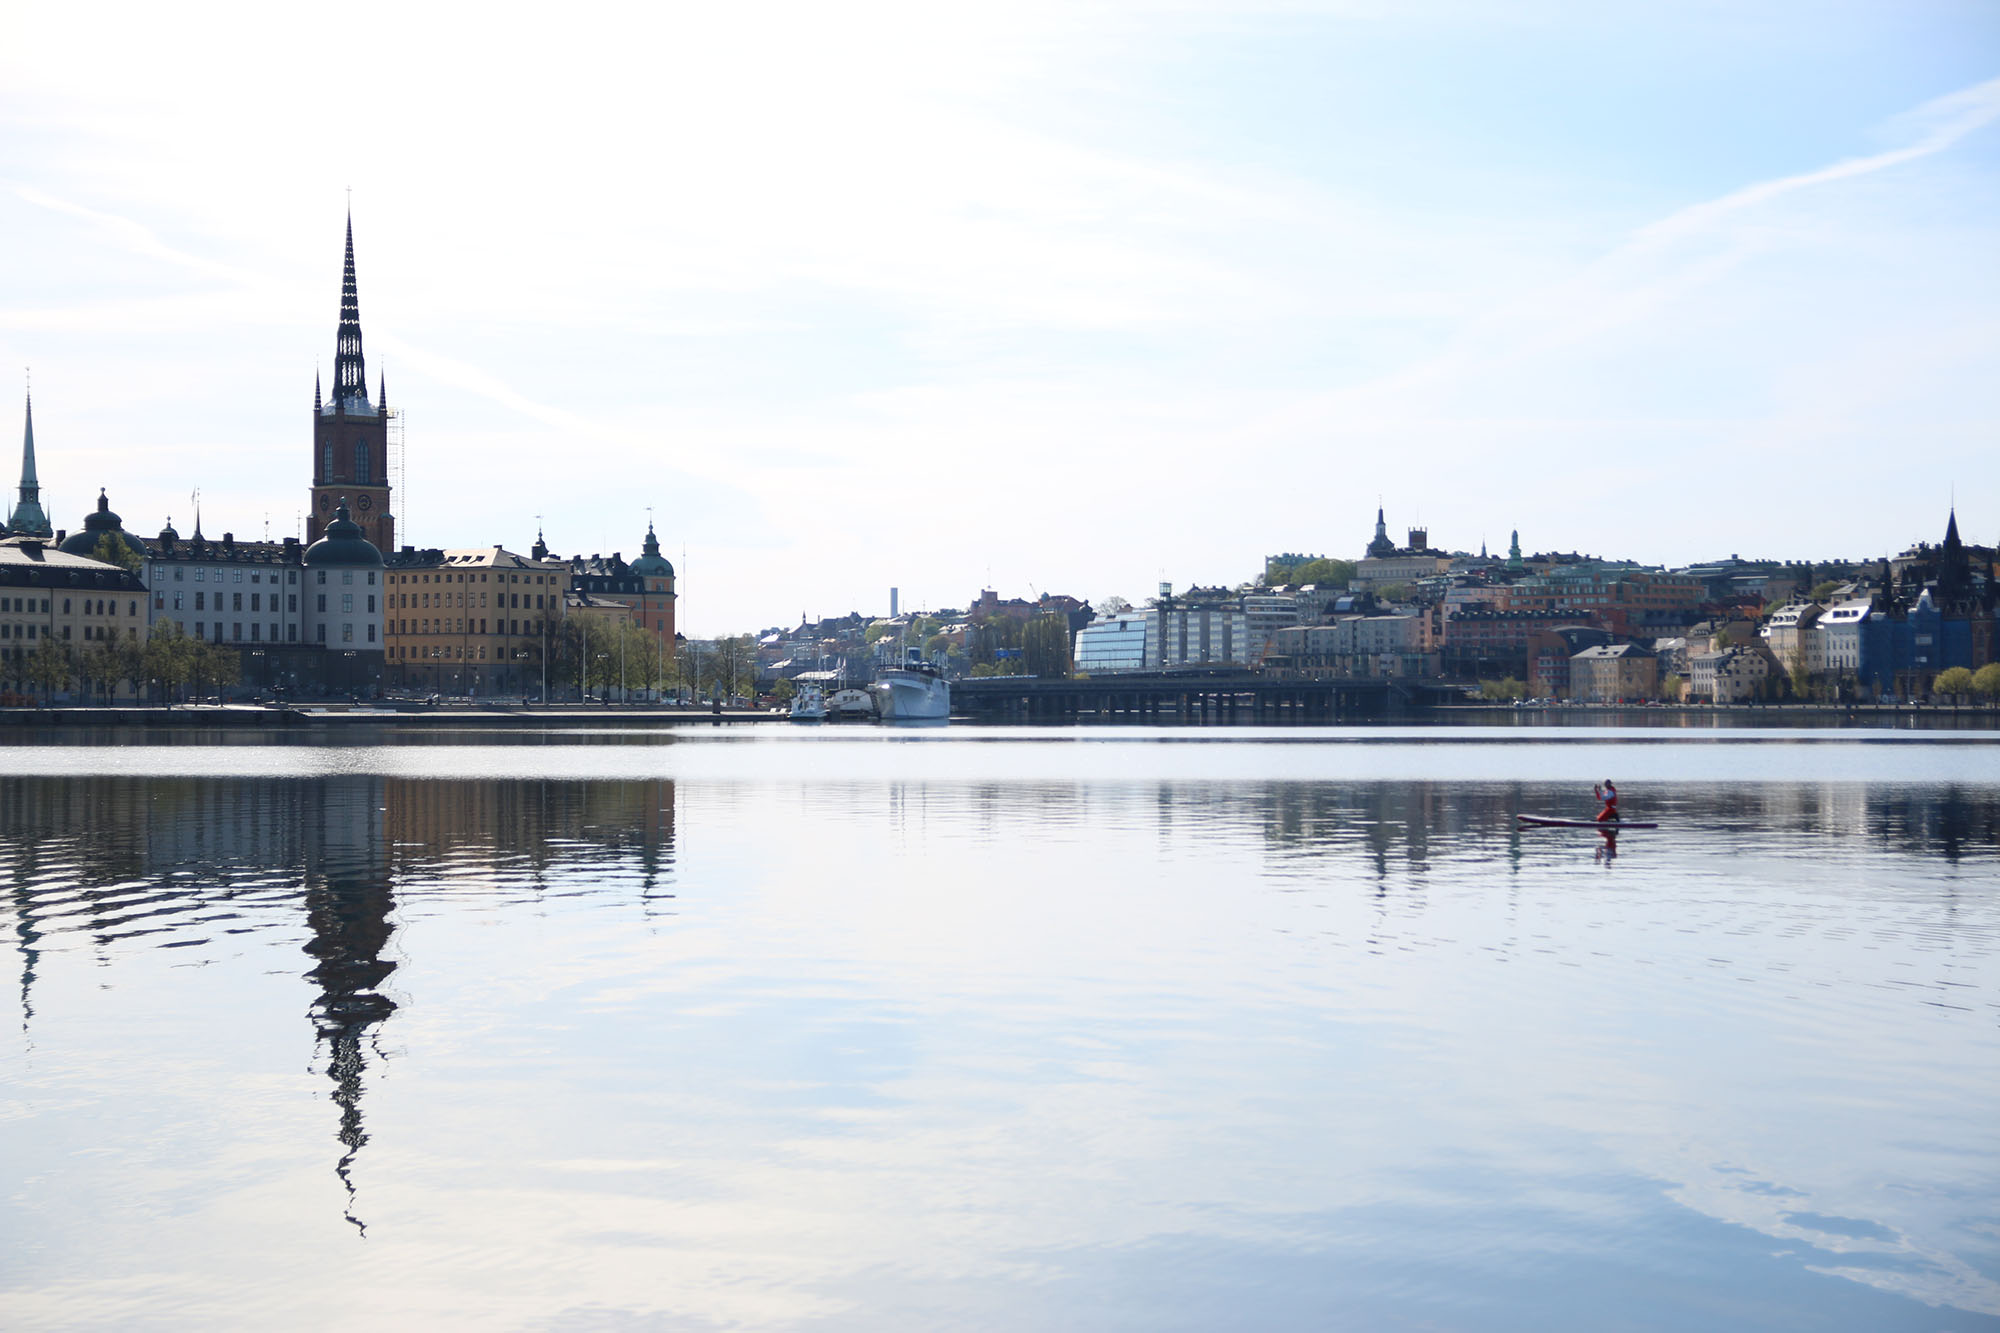 IMG_2958 stockholmshelg x